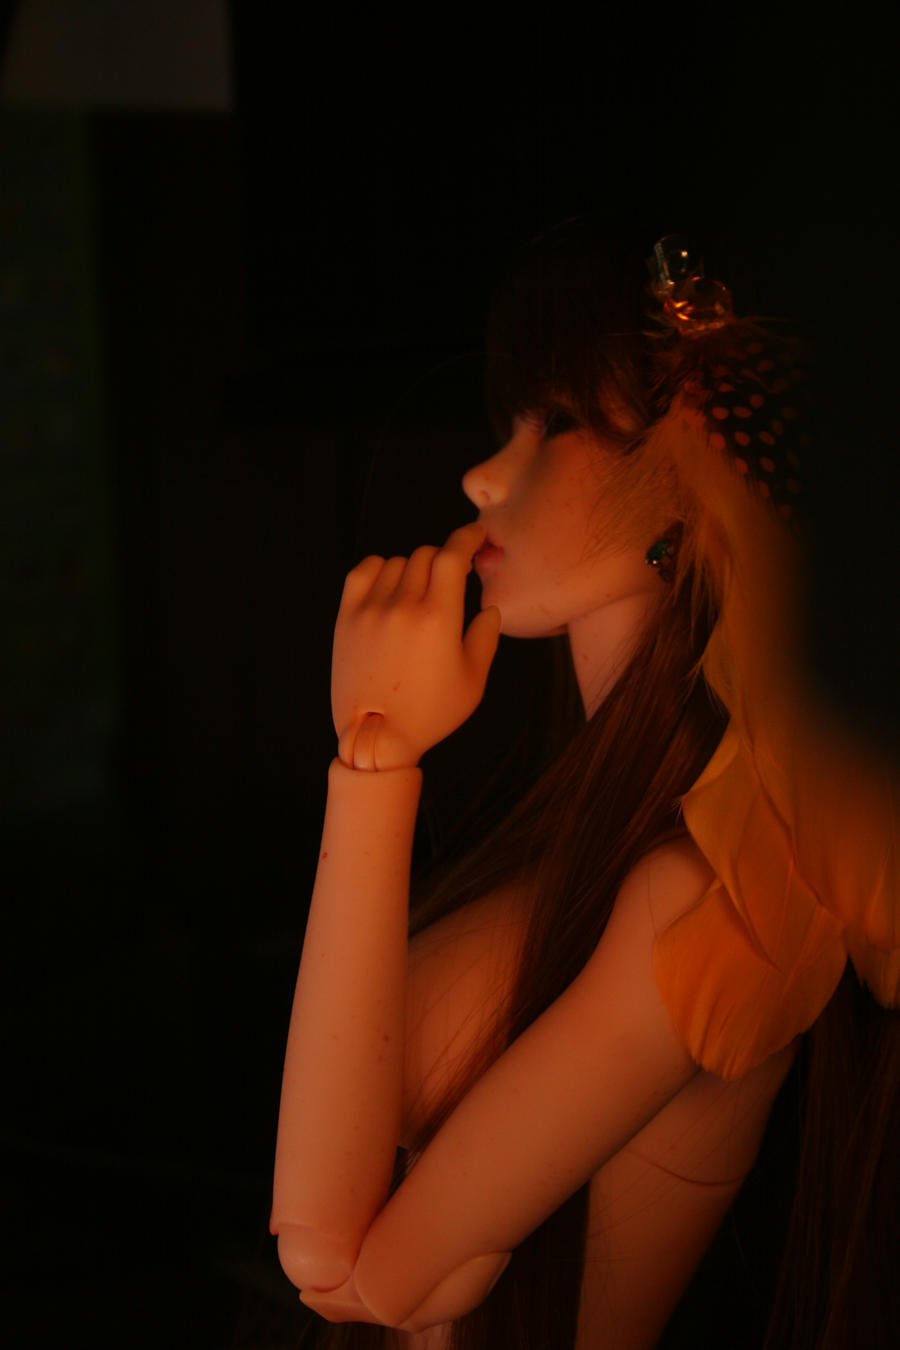 Pondering in the dark... by Cometblack